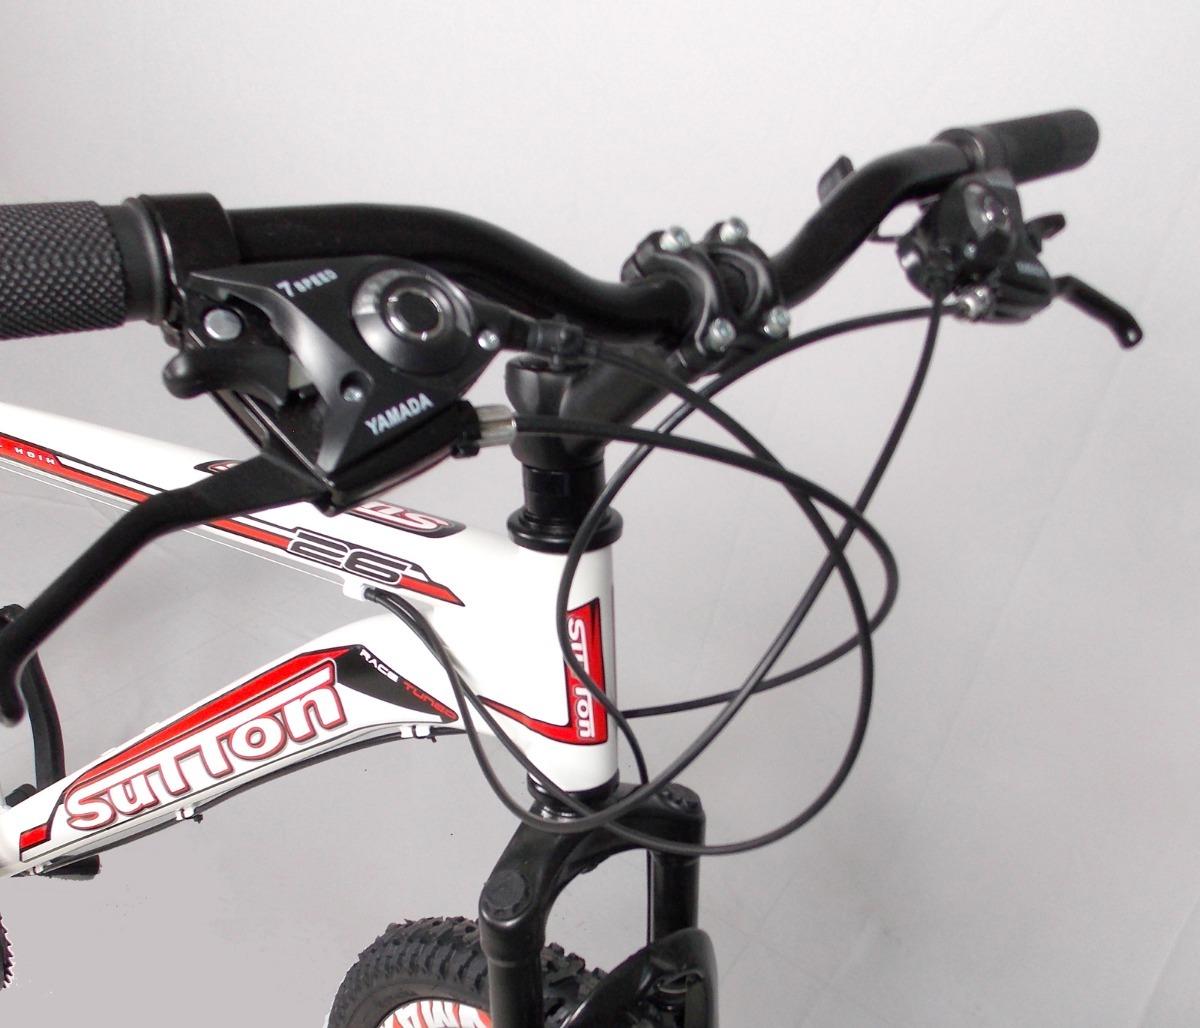 ebf70cd1a bicicleta sutton extreme aro 26 disco kit 21v shimano yamada. Carregando  zoom.